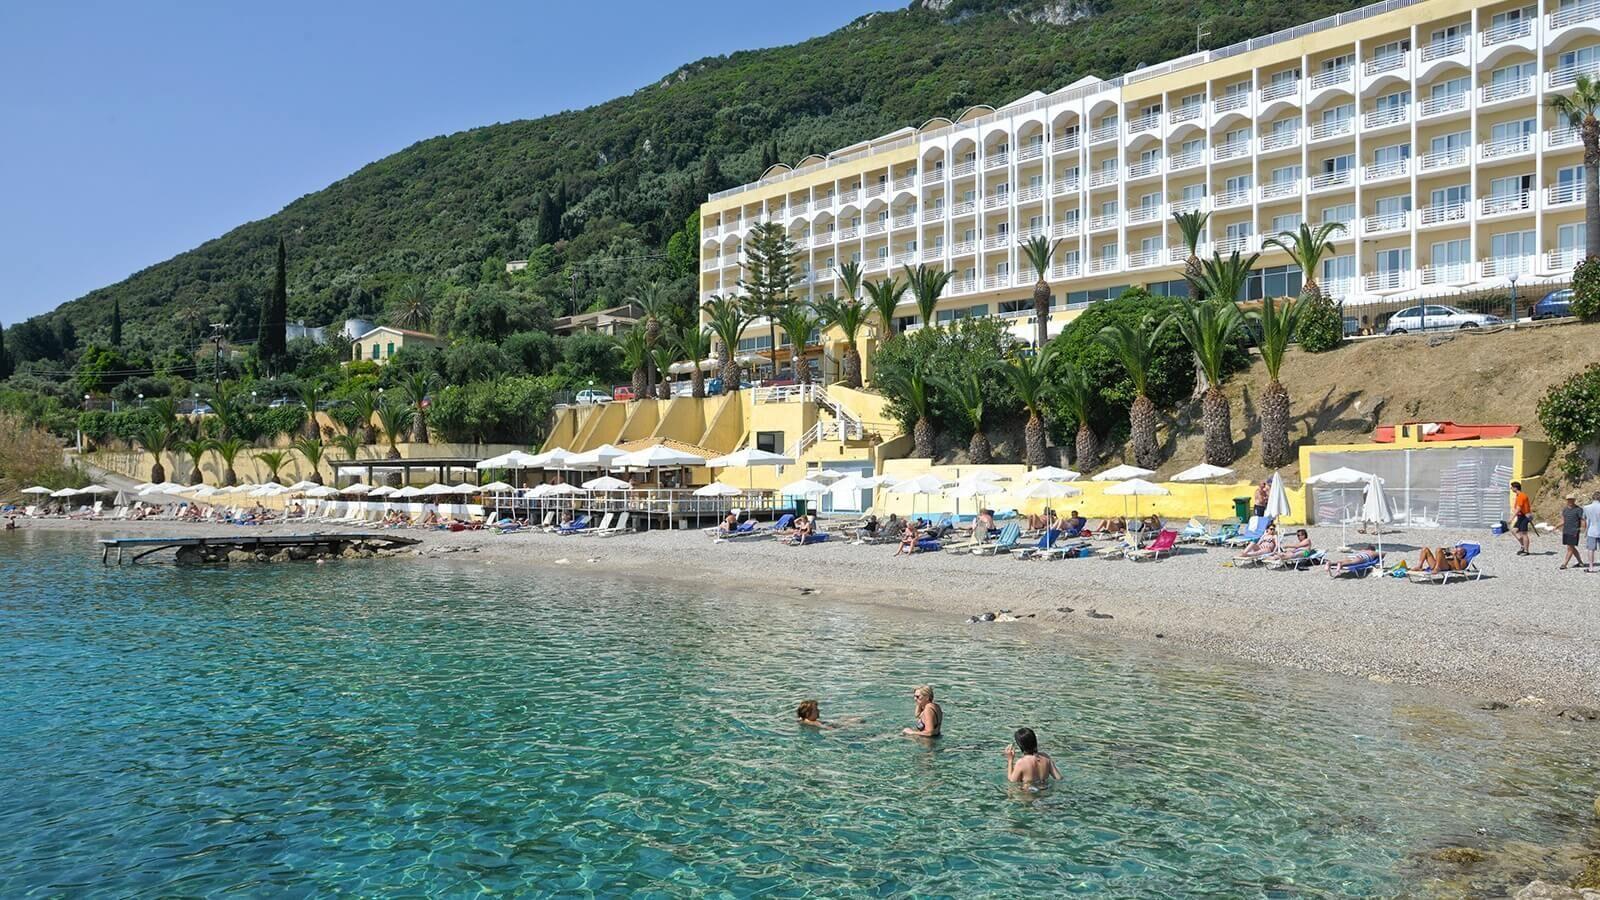 Louis Corcyra Beach Corfu  OFFICIAL SITE  All